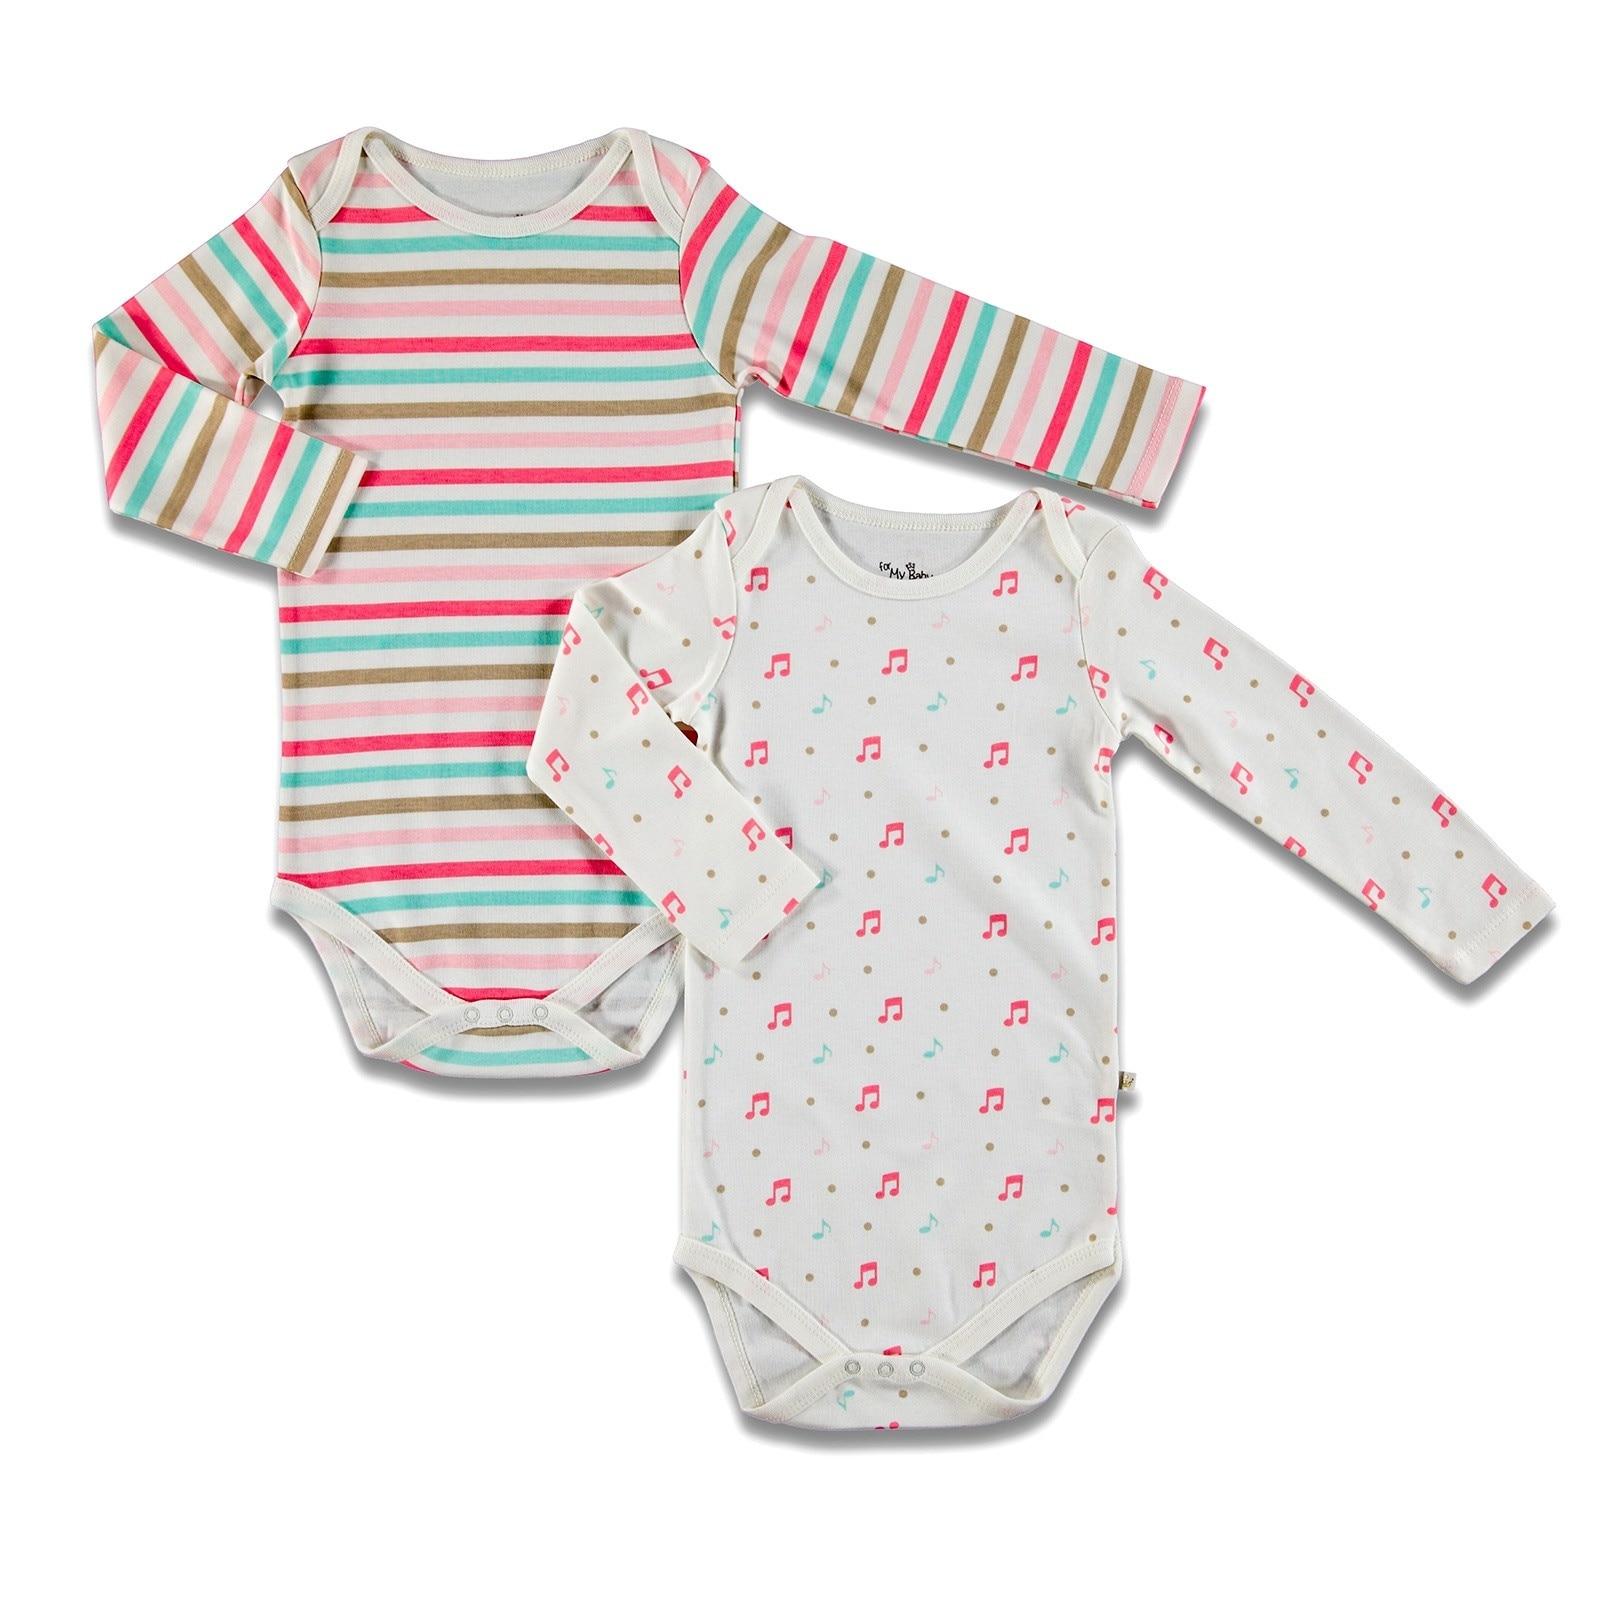 Ebebek For My Baby Yummy Long Sleeve Bodysuit 2 Pcs